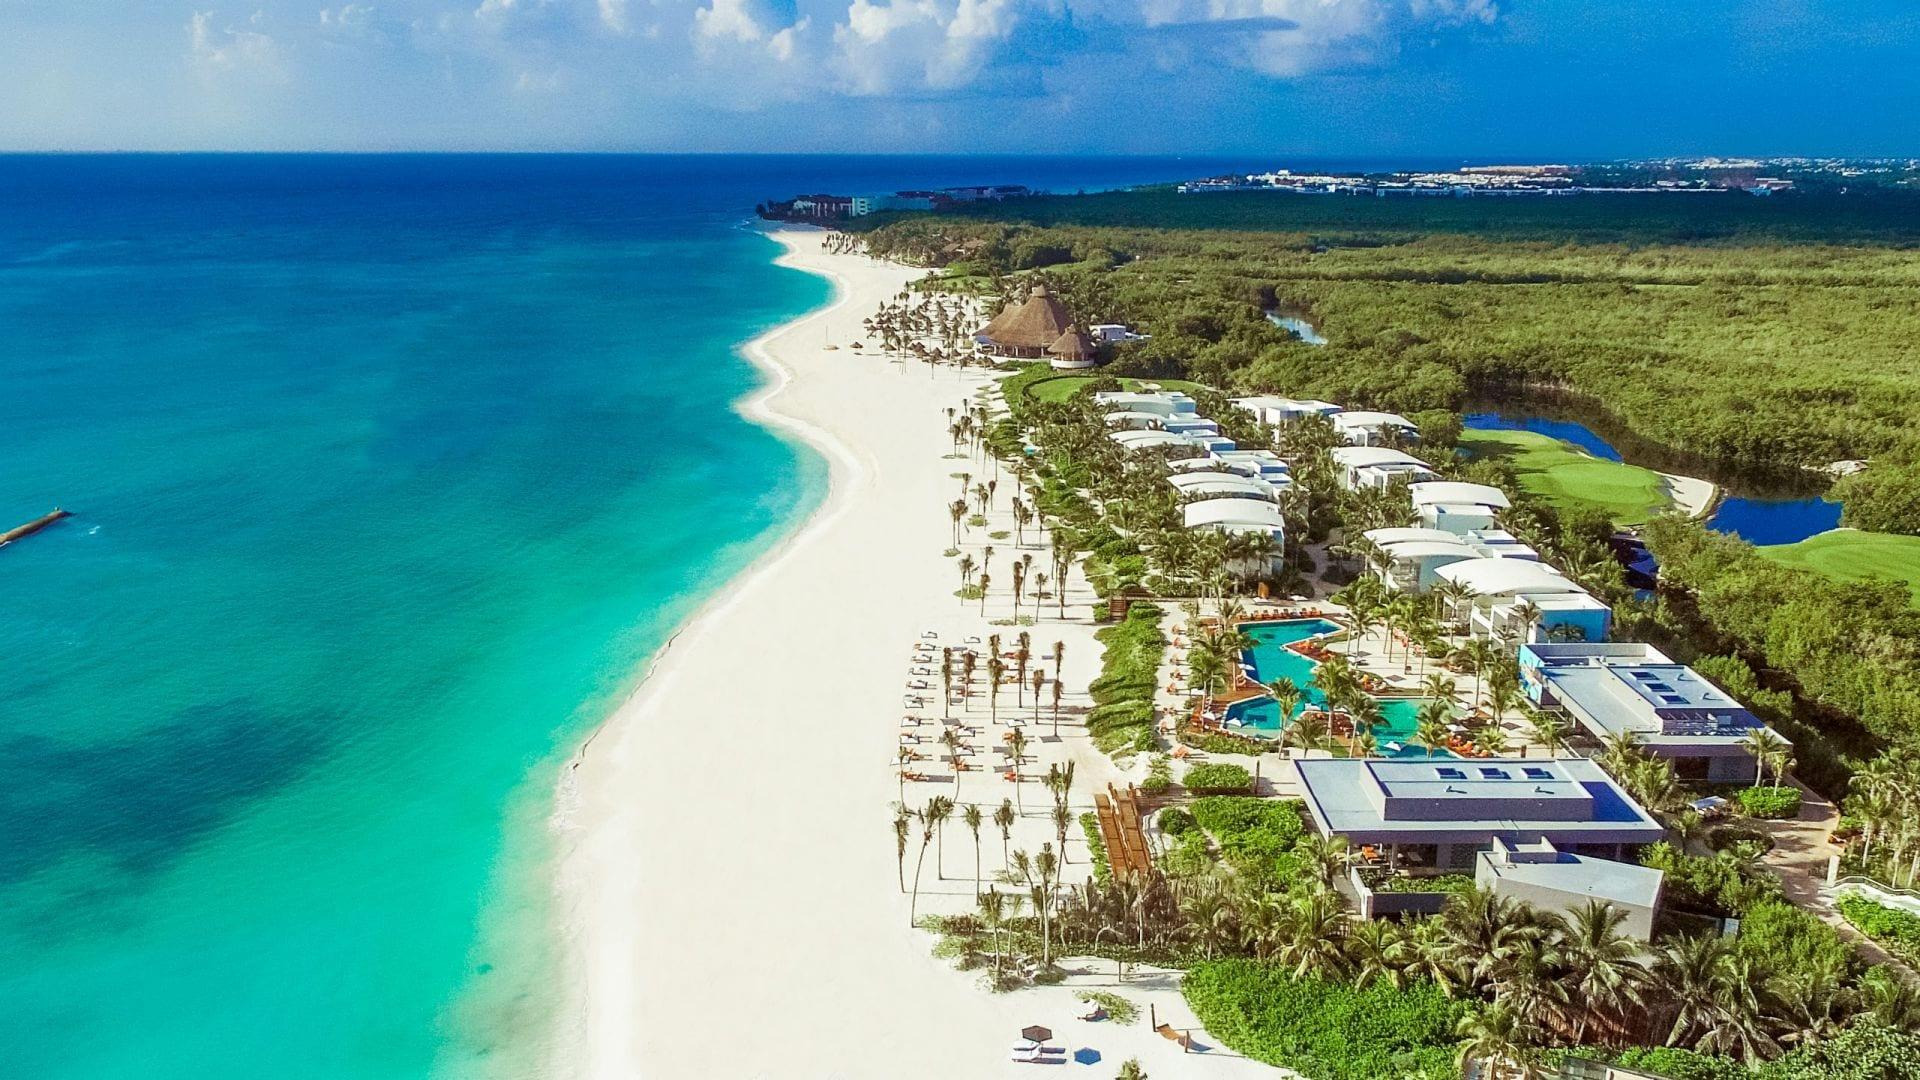 Andaz Mayakoba Resort Riviera Maya aerial